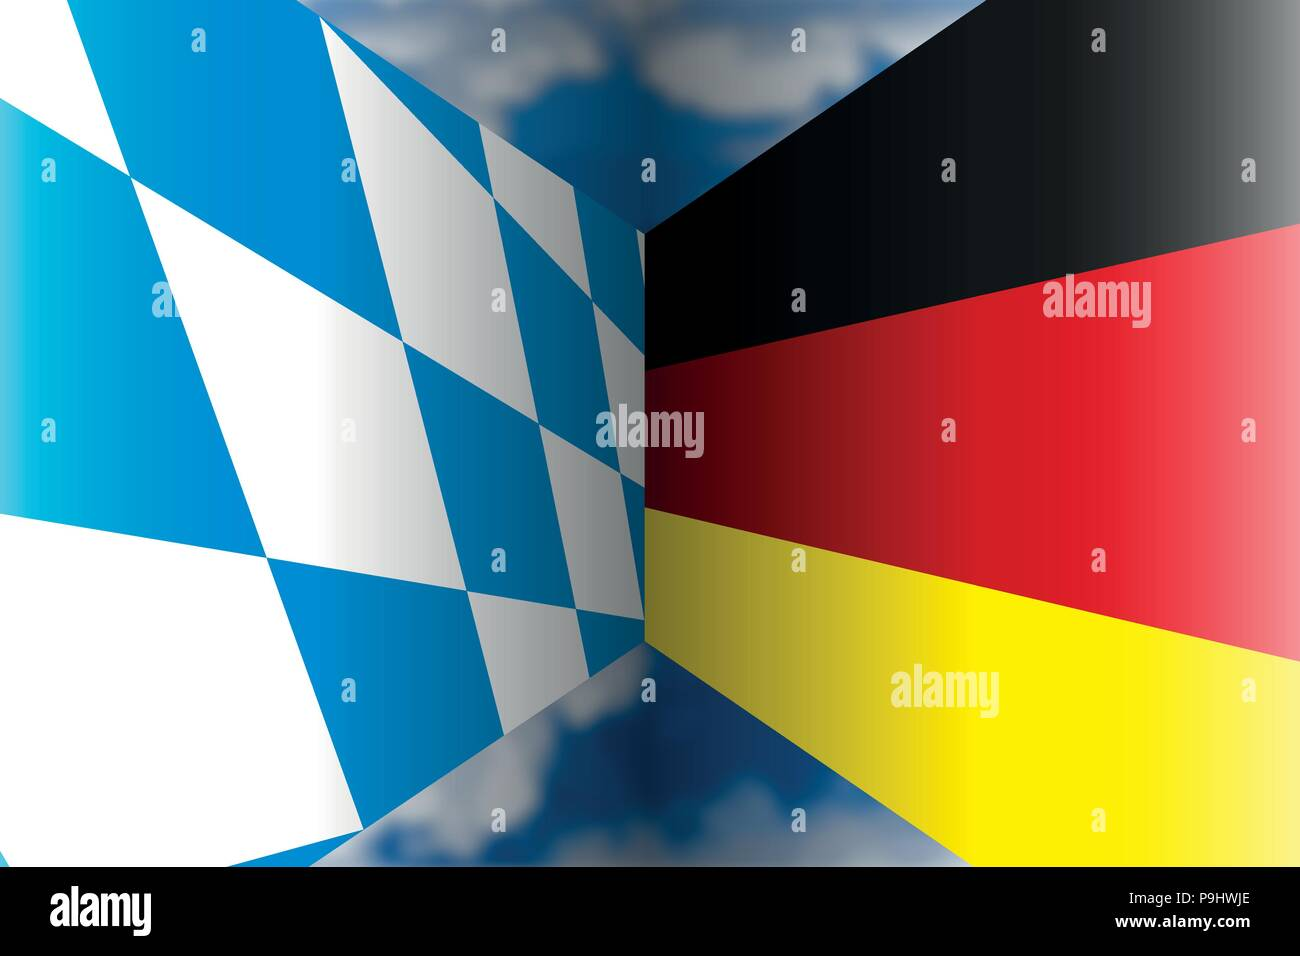 Bayern VS Germany flags, illustration - Stock Vector